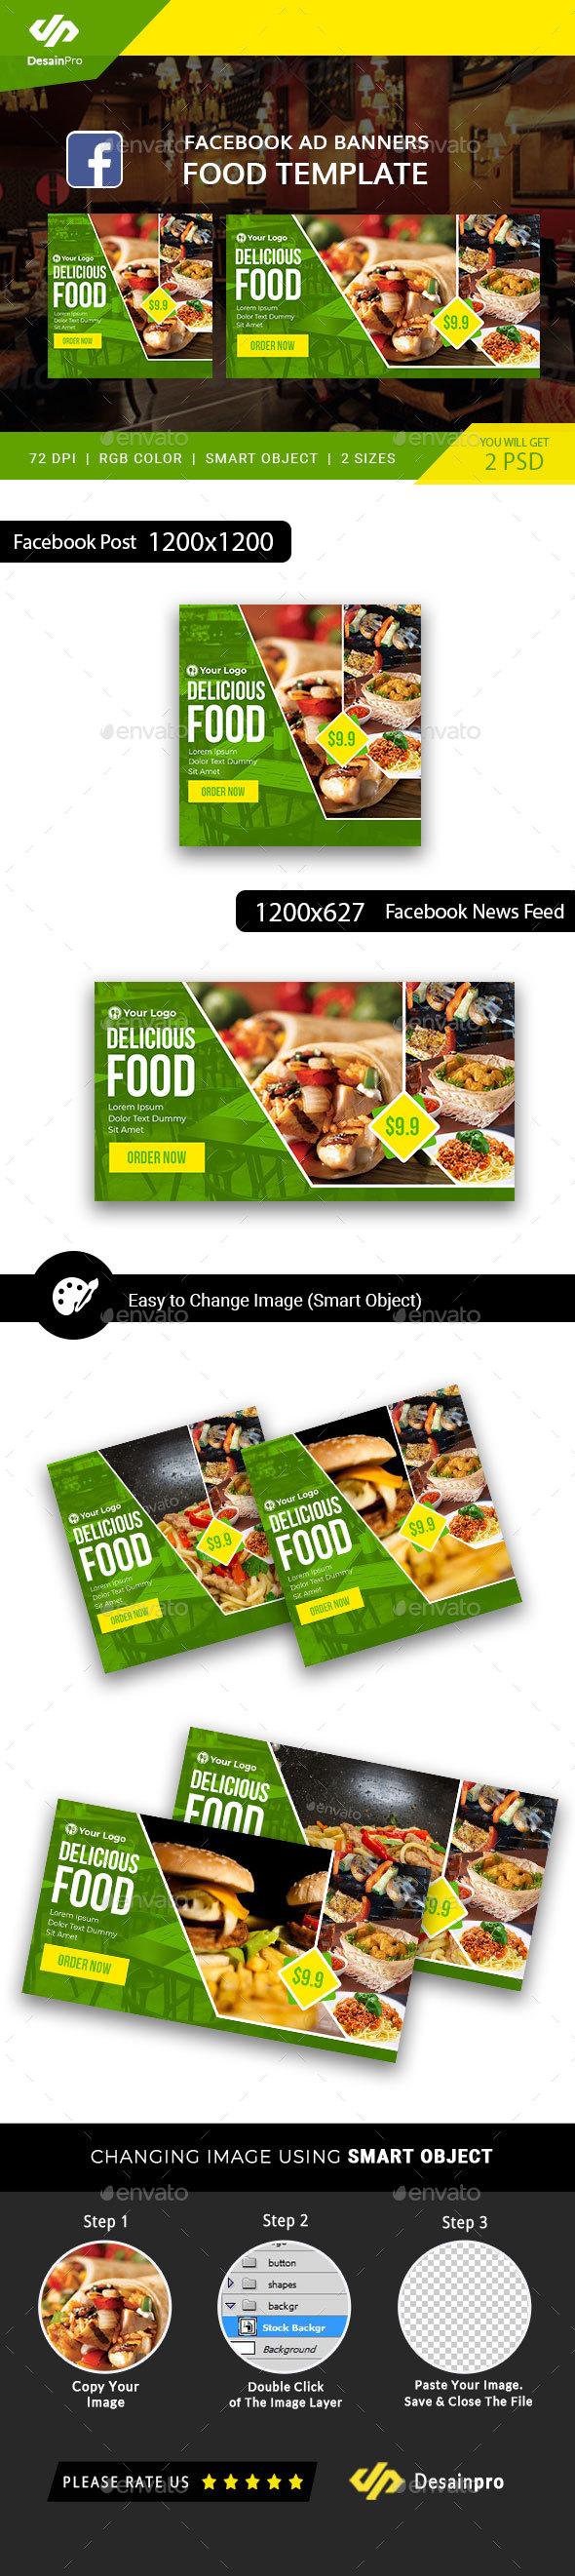 Food Business FB Ad Banner - AR